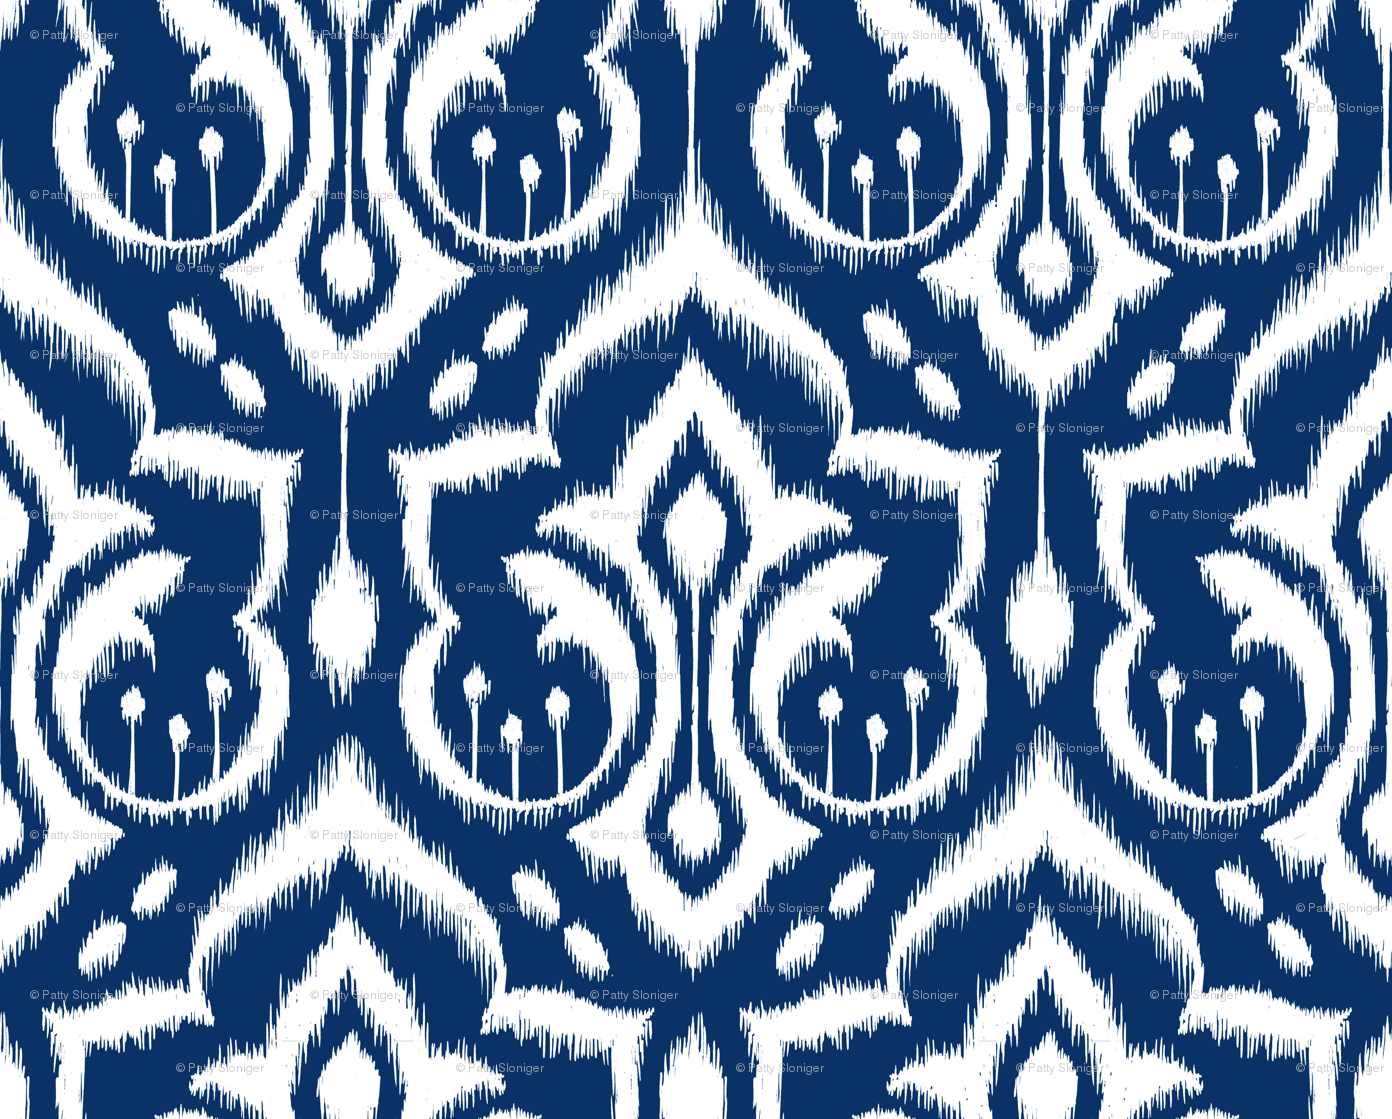 Navy and white wallpaper wallpapersafari for Navy blue wallpaper for walls